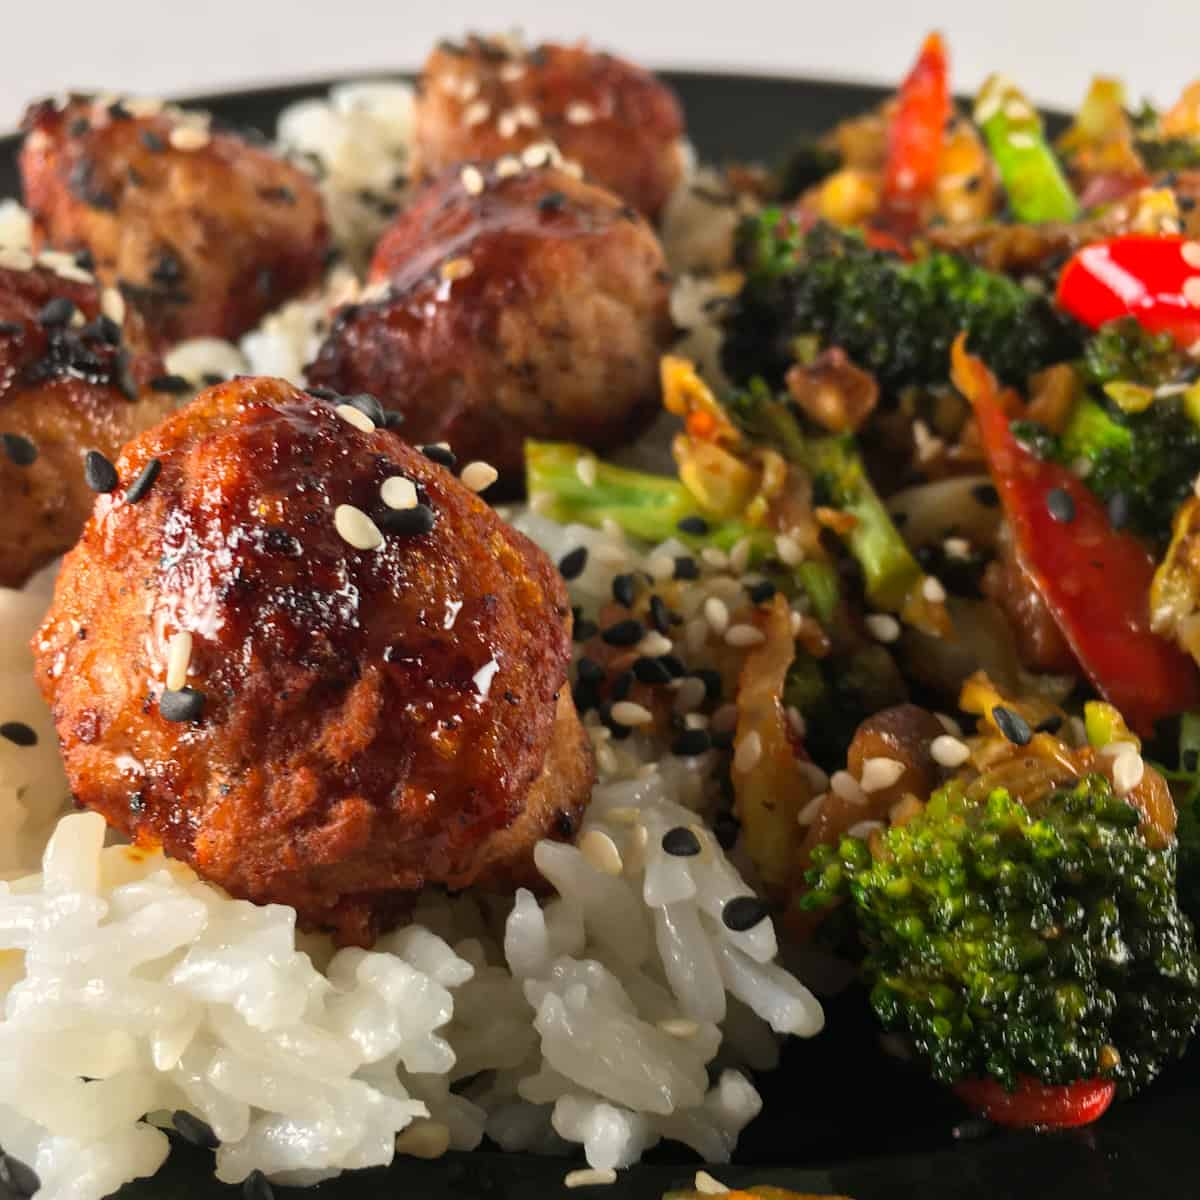 Green chef chili ginger pork meatballs